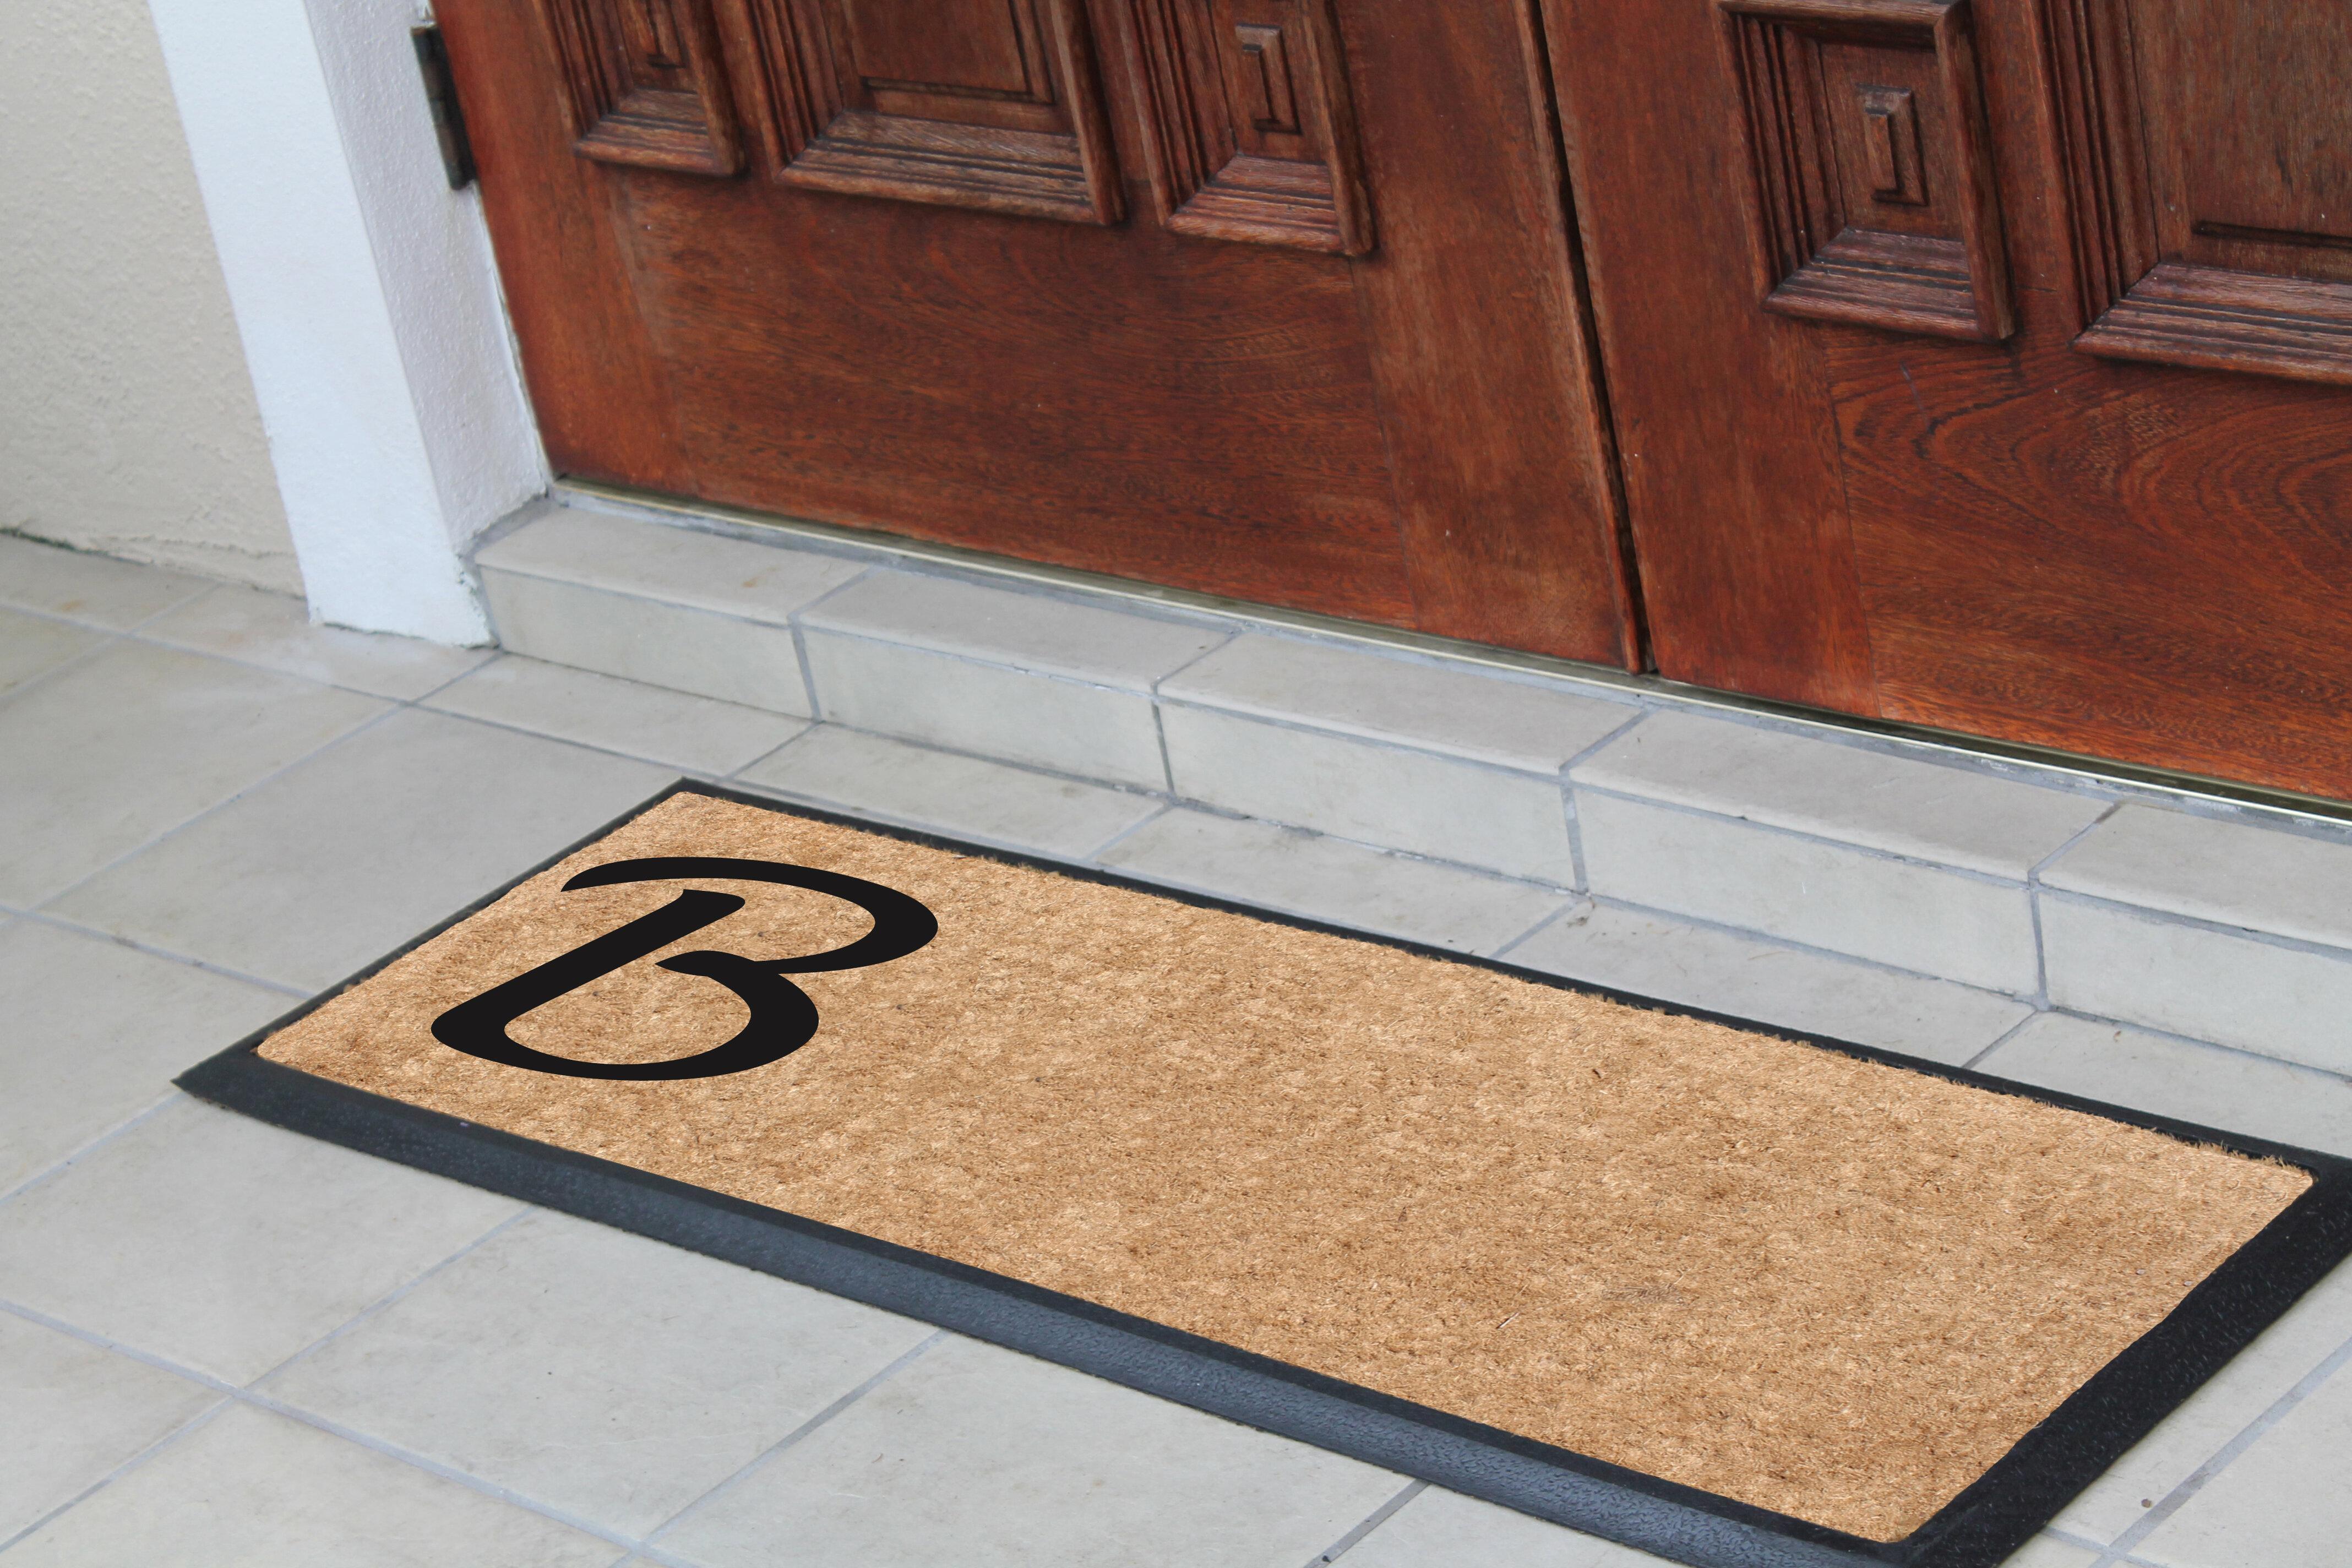 Darby Home Co Albertina Rubber And Coir Monogrammed Double Doormat Wayfair